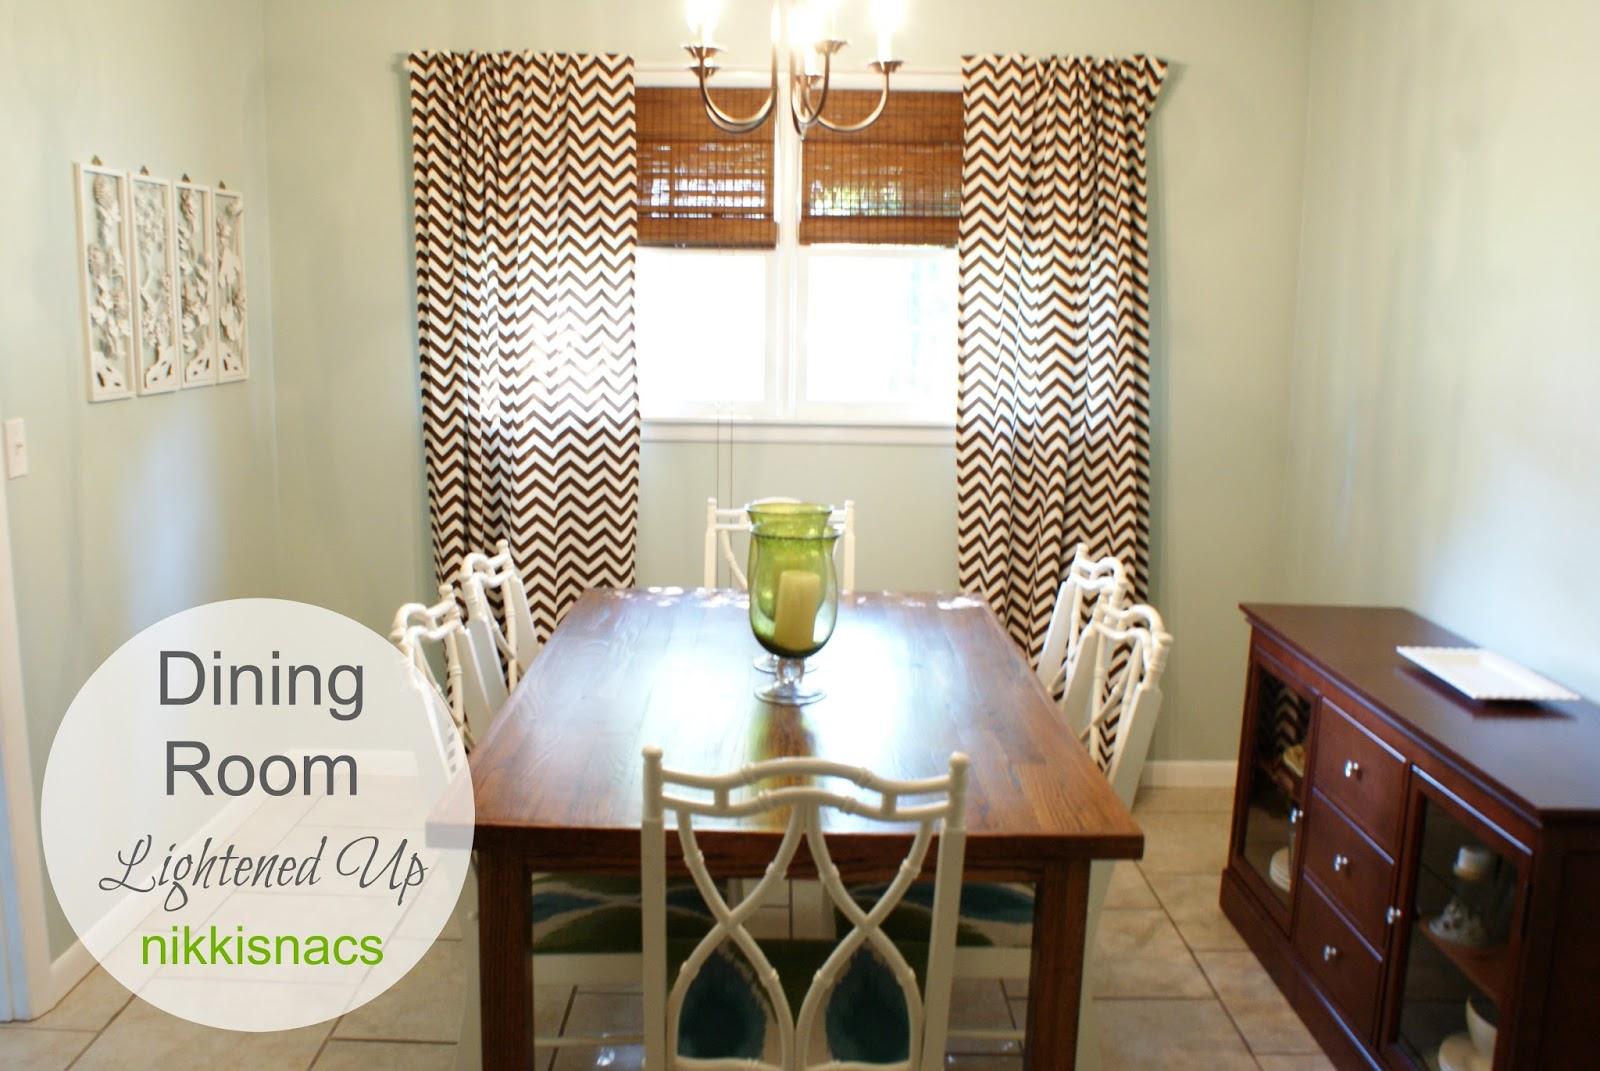 Nikkis 39 nacs dining room homeschool room lightened up for Homeschool dining room ideas